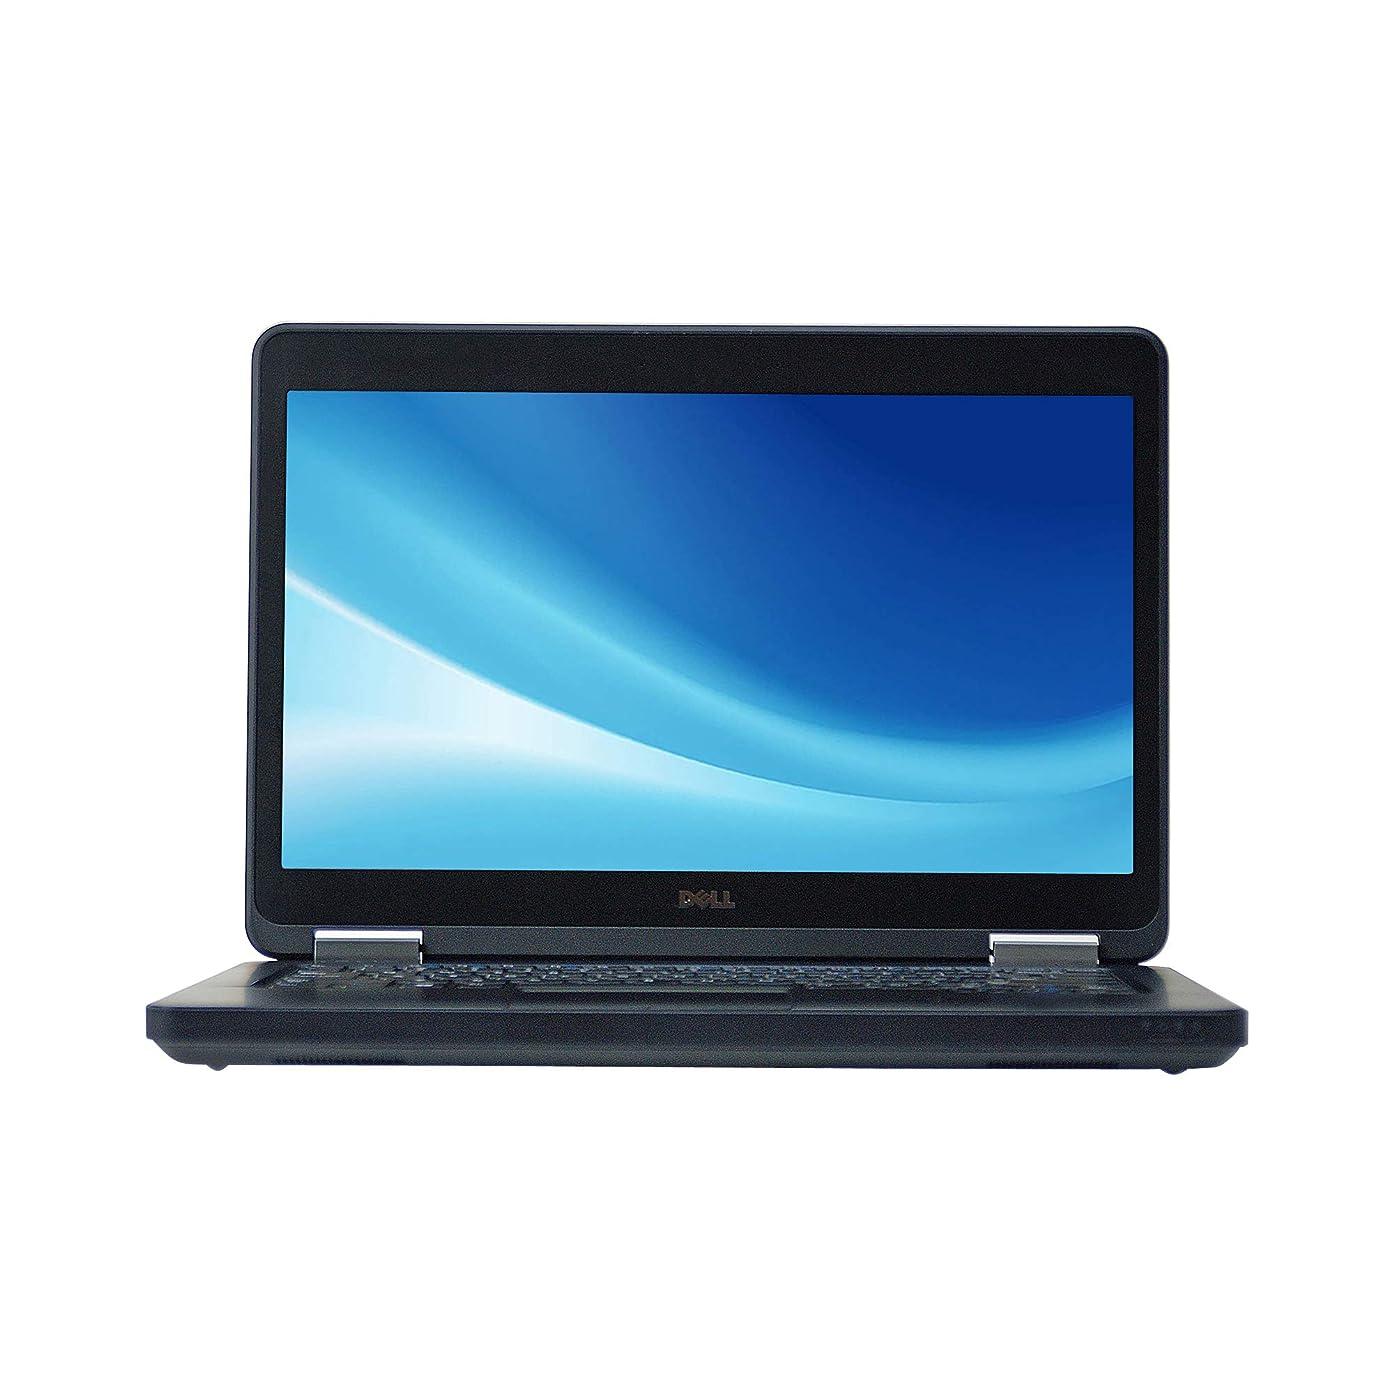 Dell Latitude E5440 14in Laptop, Core i3-4010U 1.7GHz, 4GB Ram, 500GB HDD, DVD, Windows 10 Pro 64bit (Renewed)